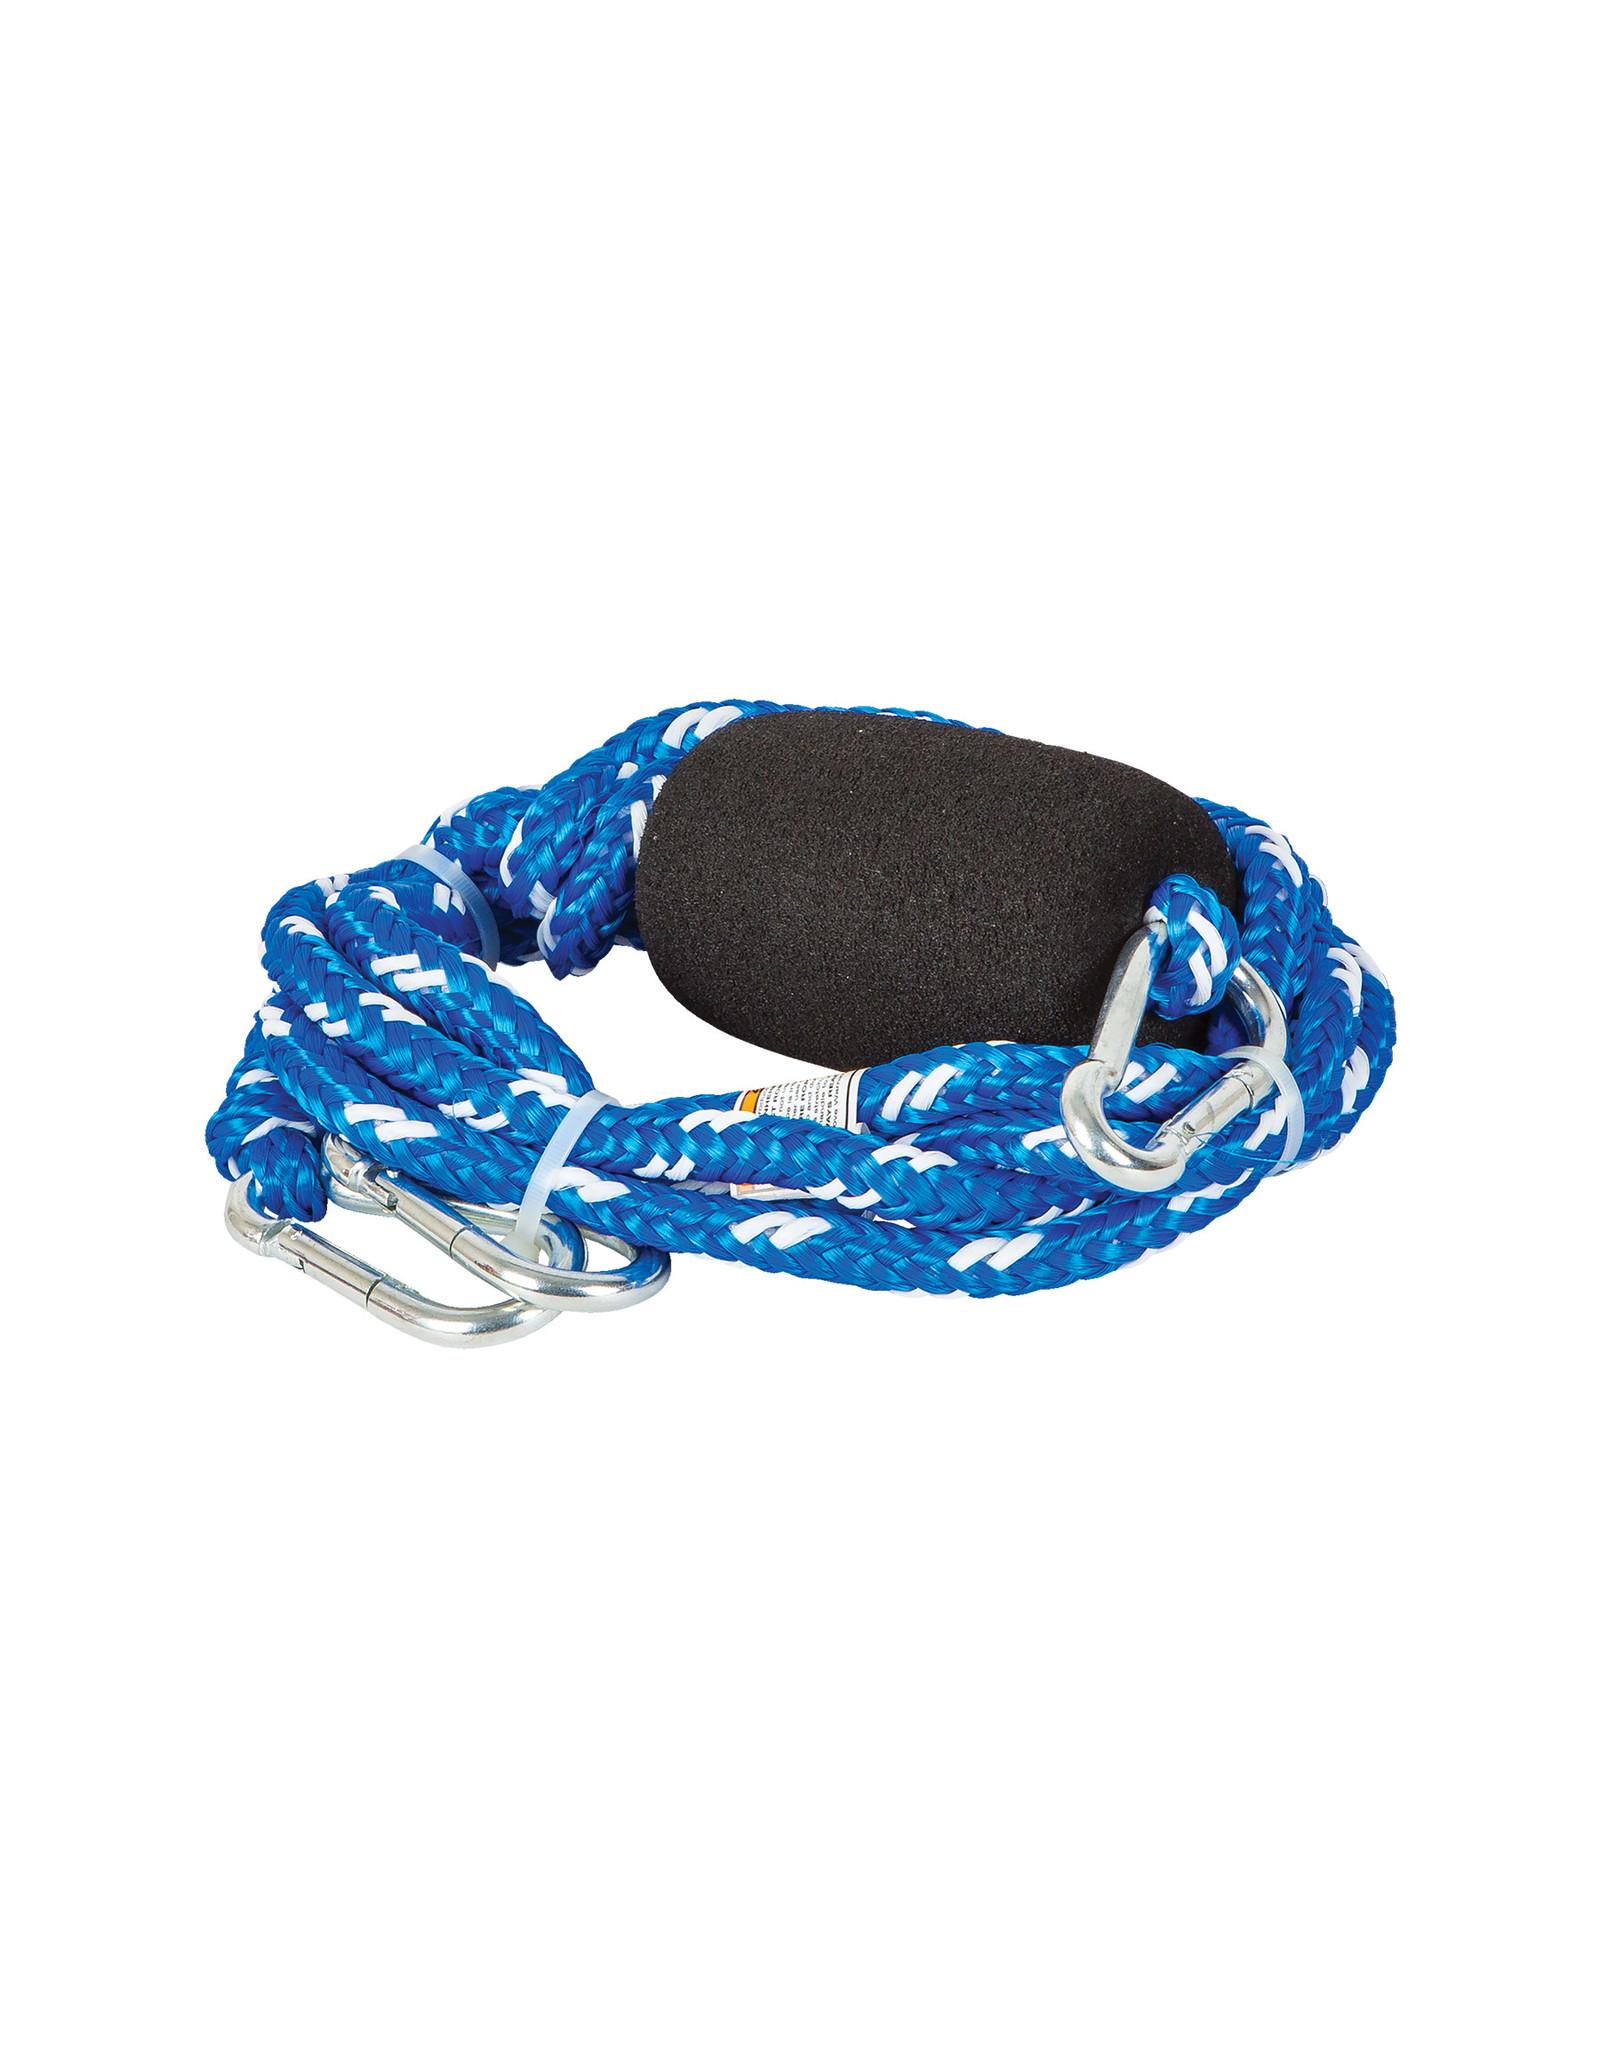 O'Brien 8' Floating Ski Tow Harness (Blue)